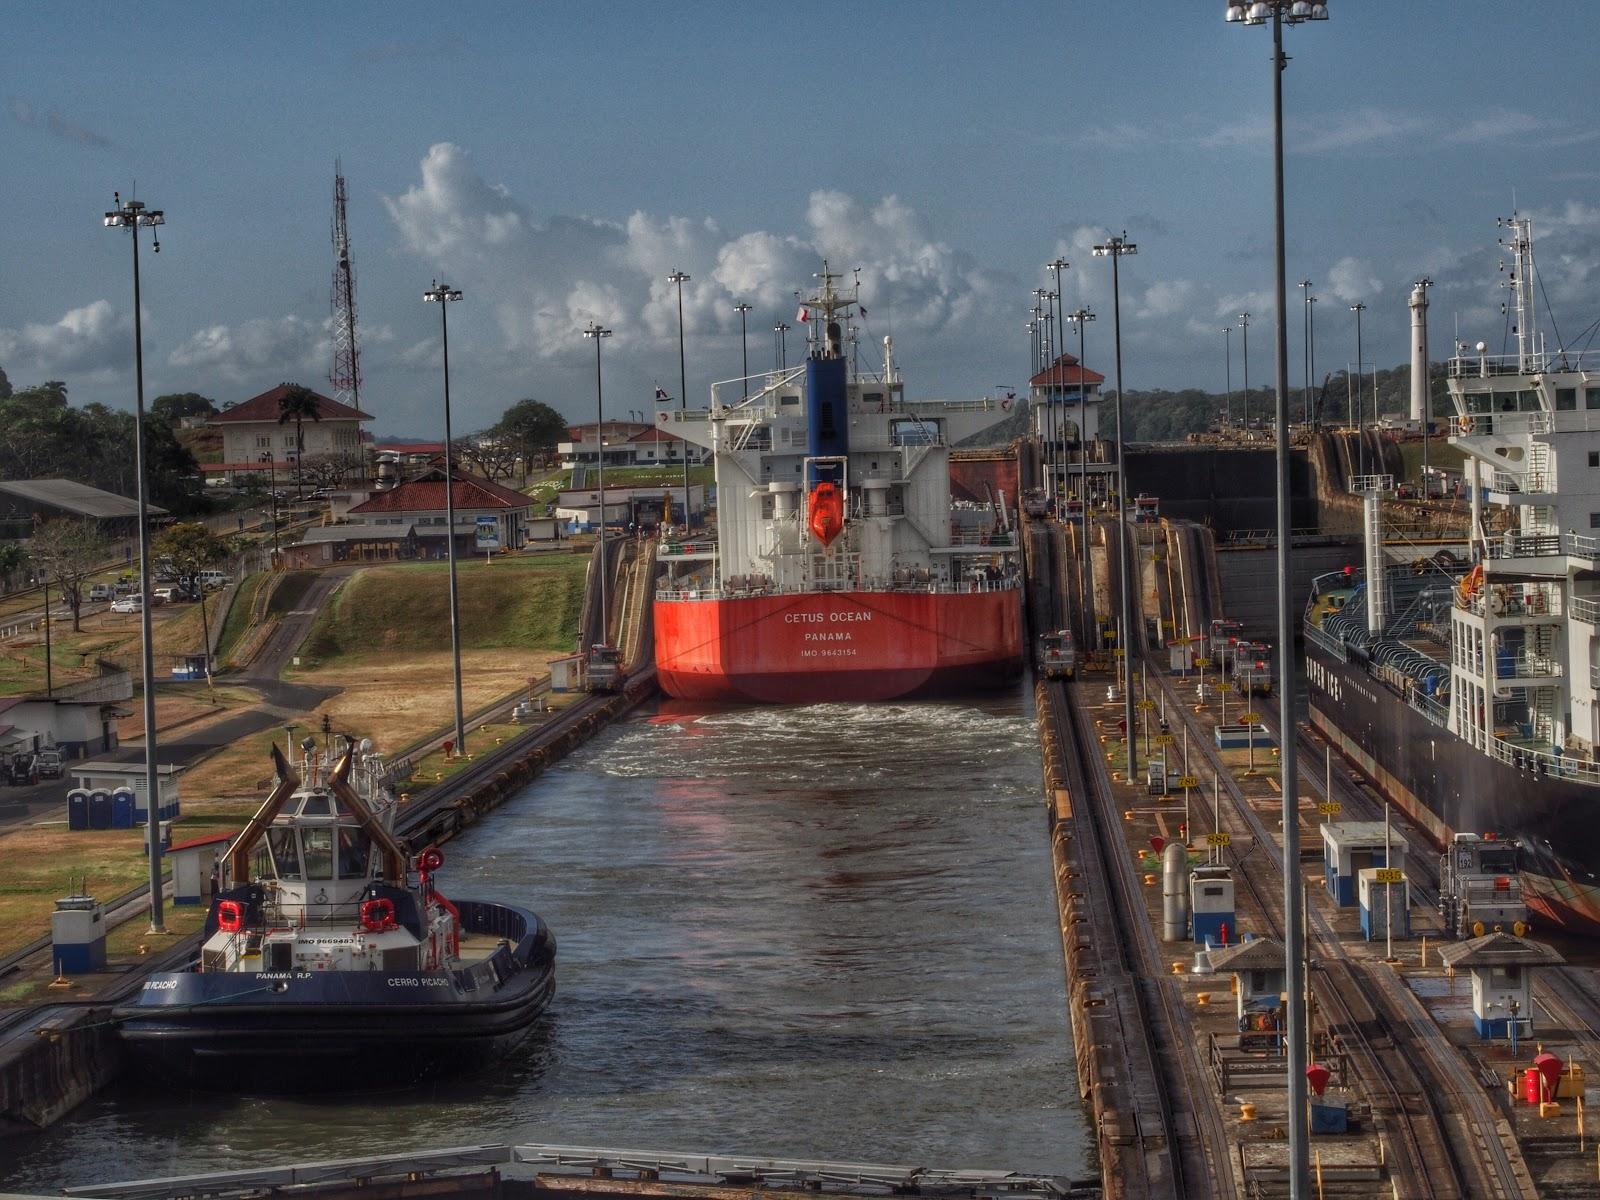 Panama Canal #PanamaCanal #HollandAmerica #cruise ©2014 Nancy Lundebjerg